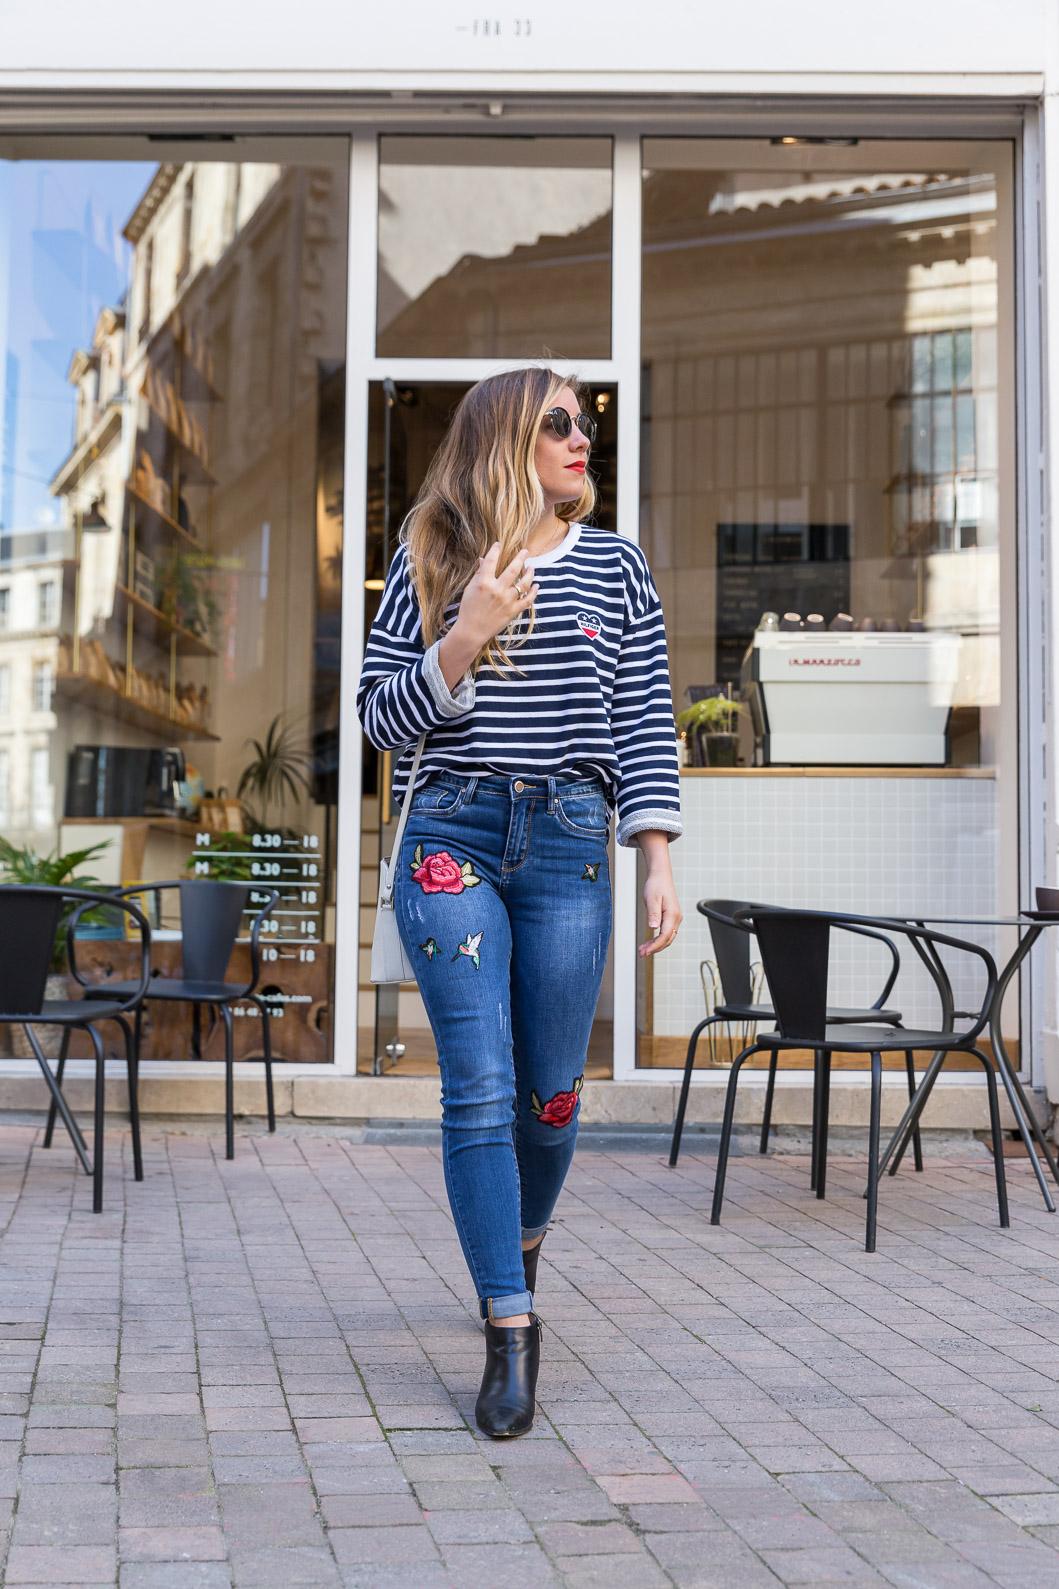 Blog mode jean broderie